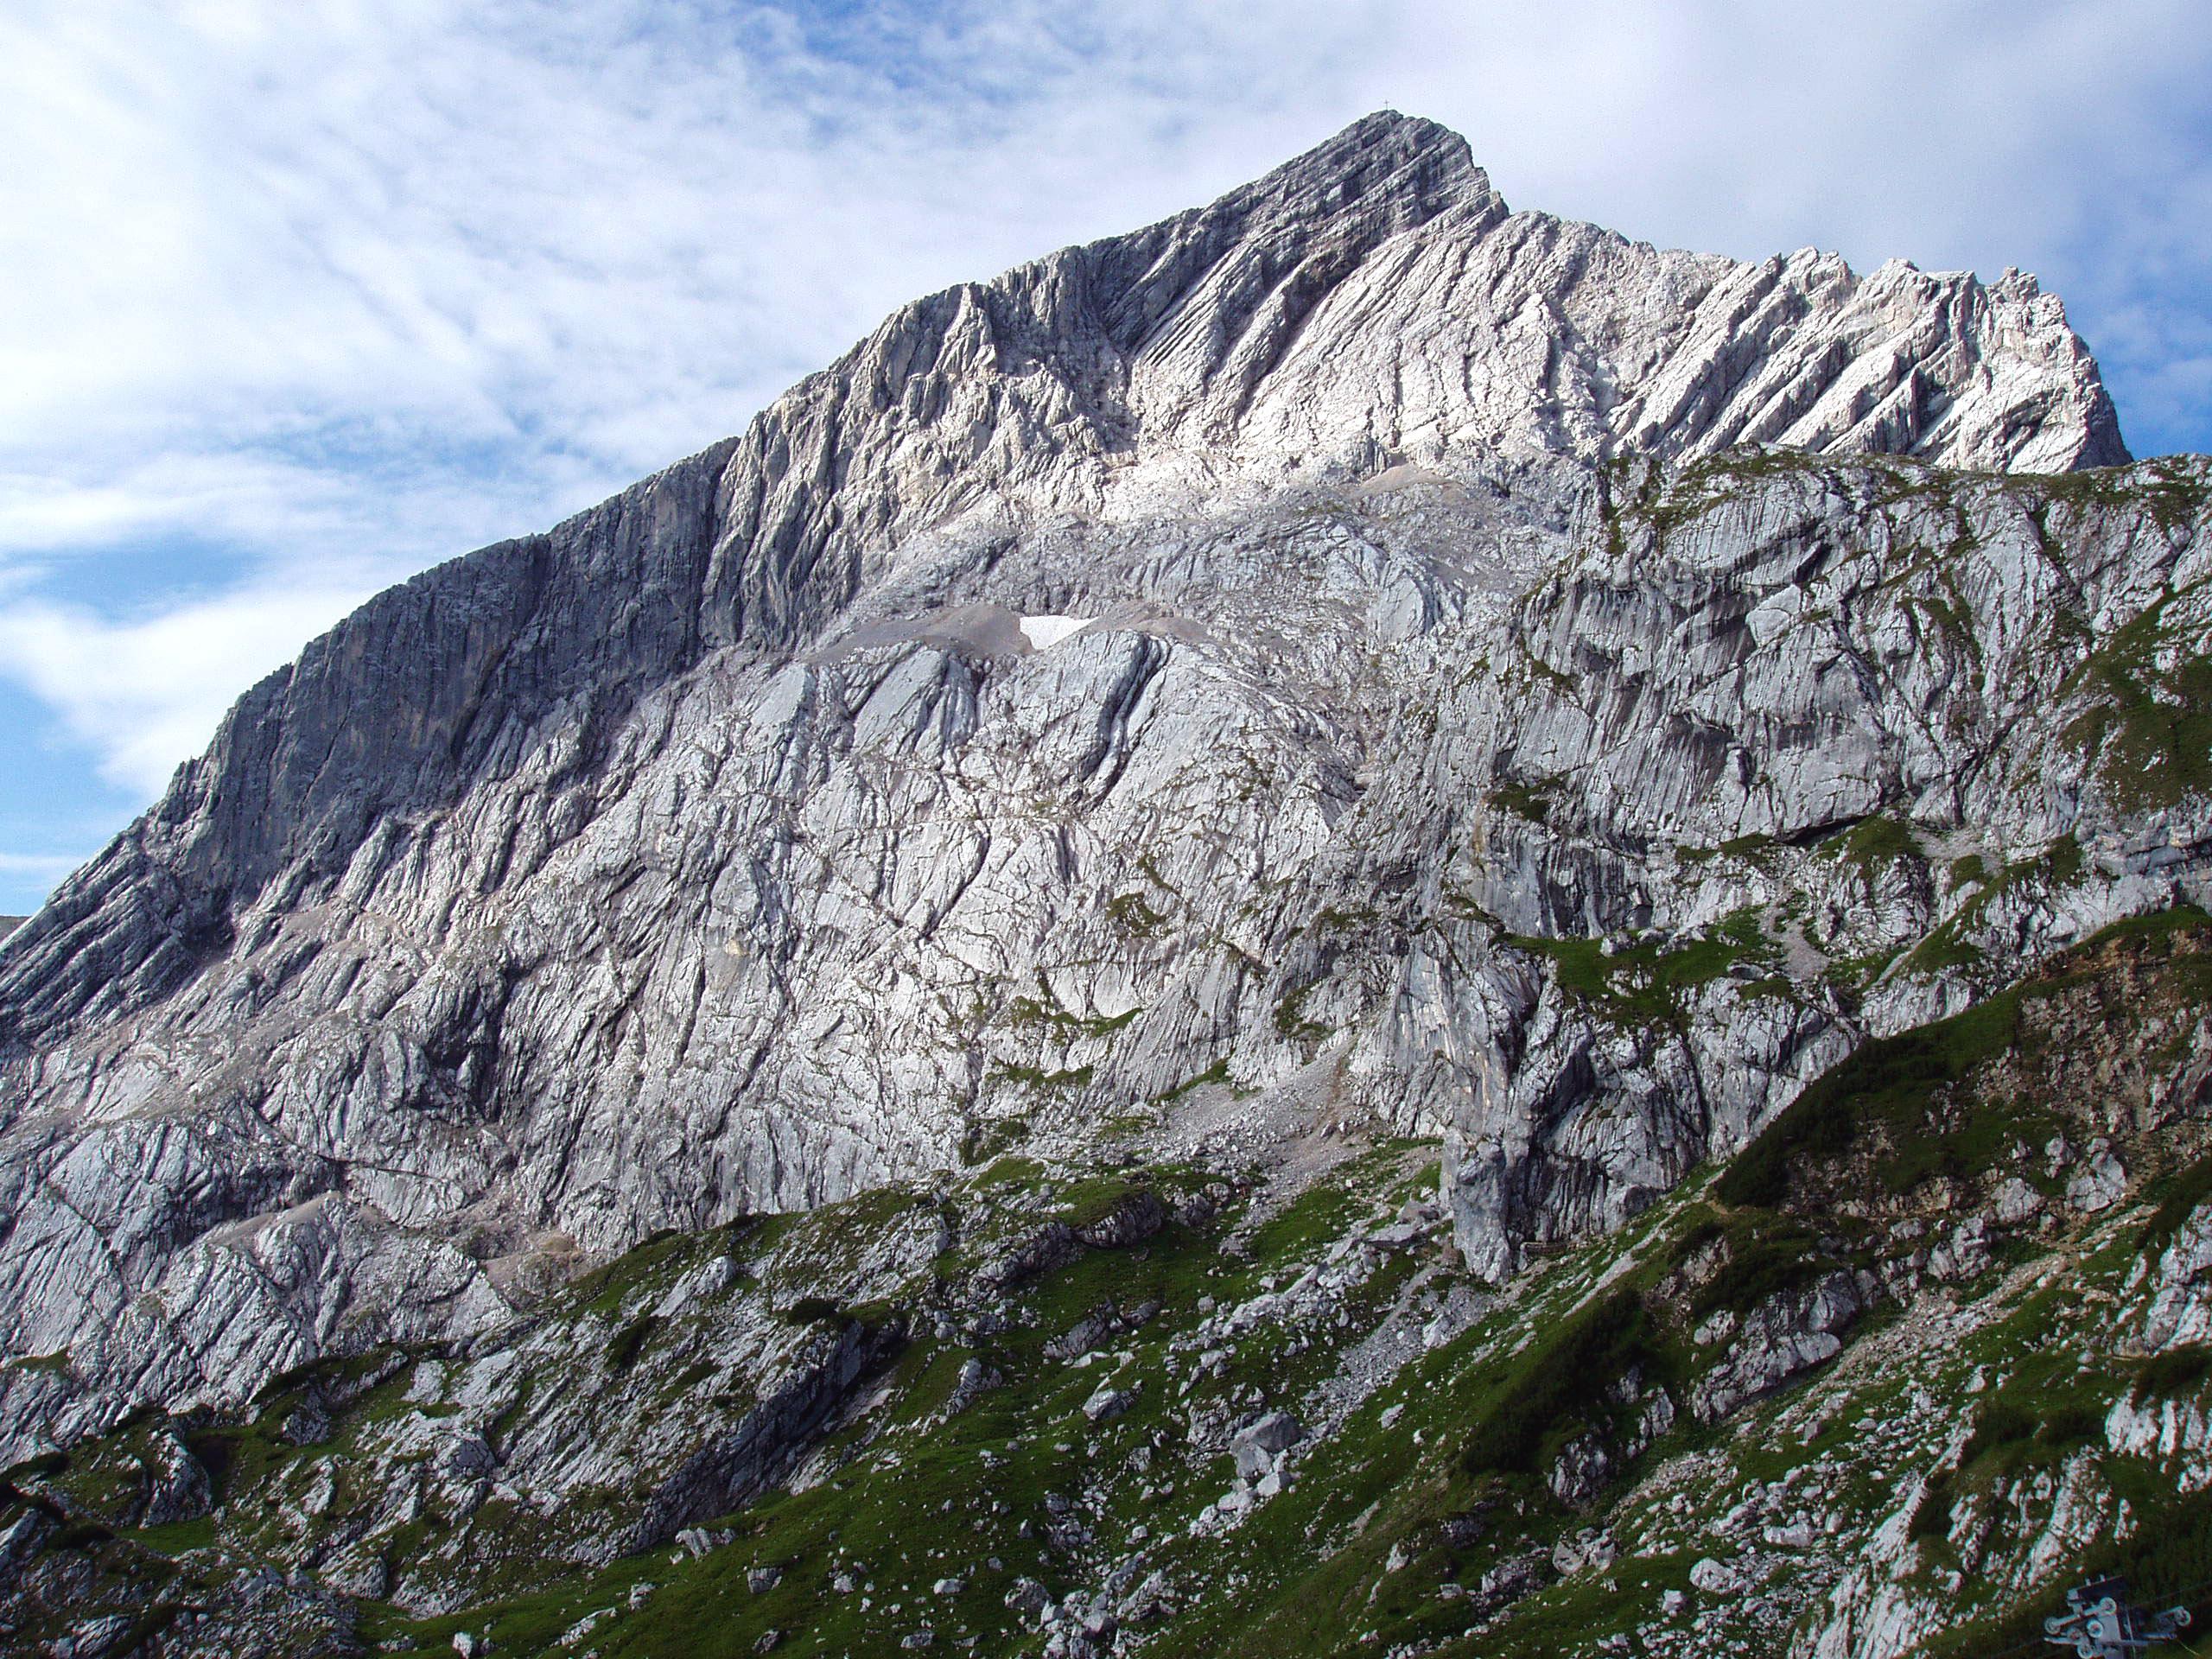 Klettersteig Alpspitze : Alpspitze u wikipedia